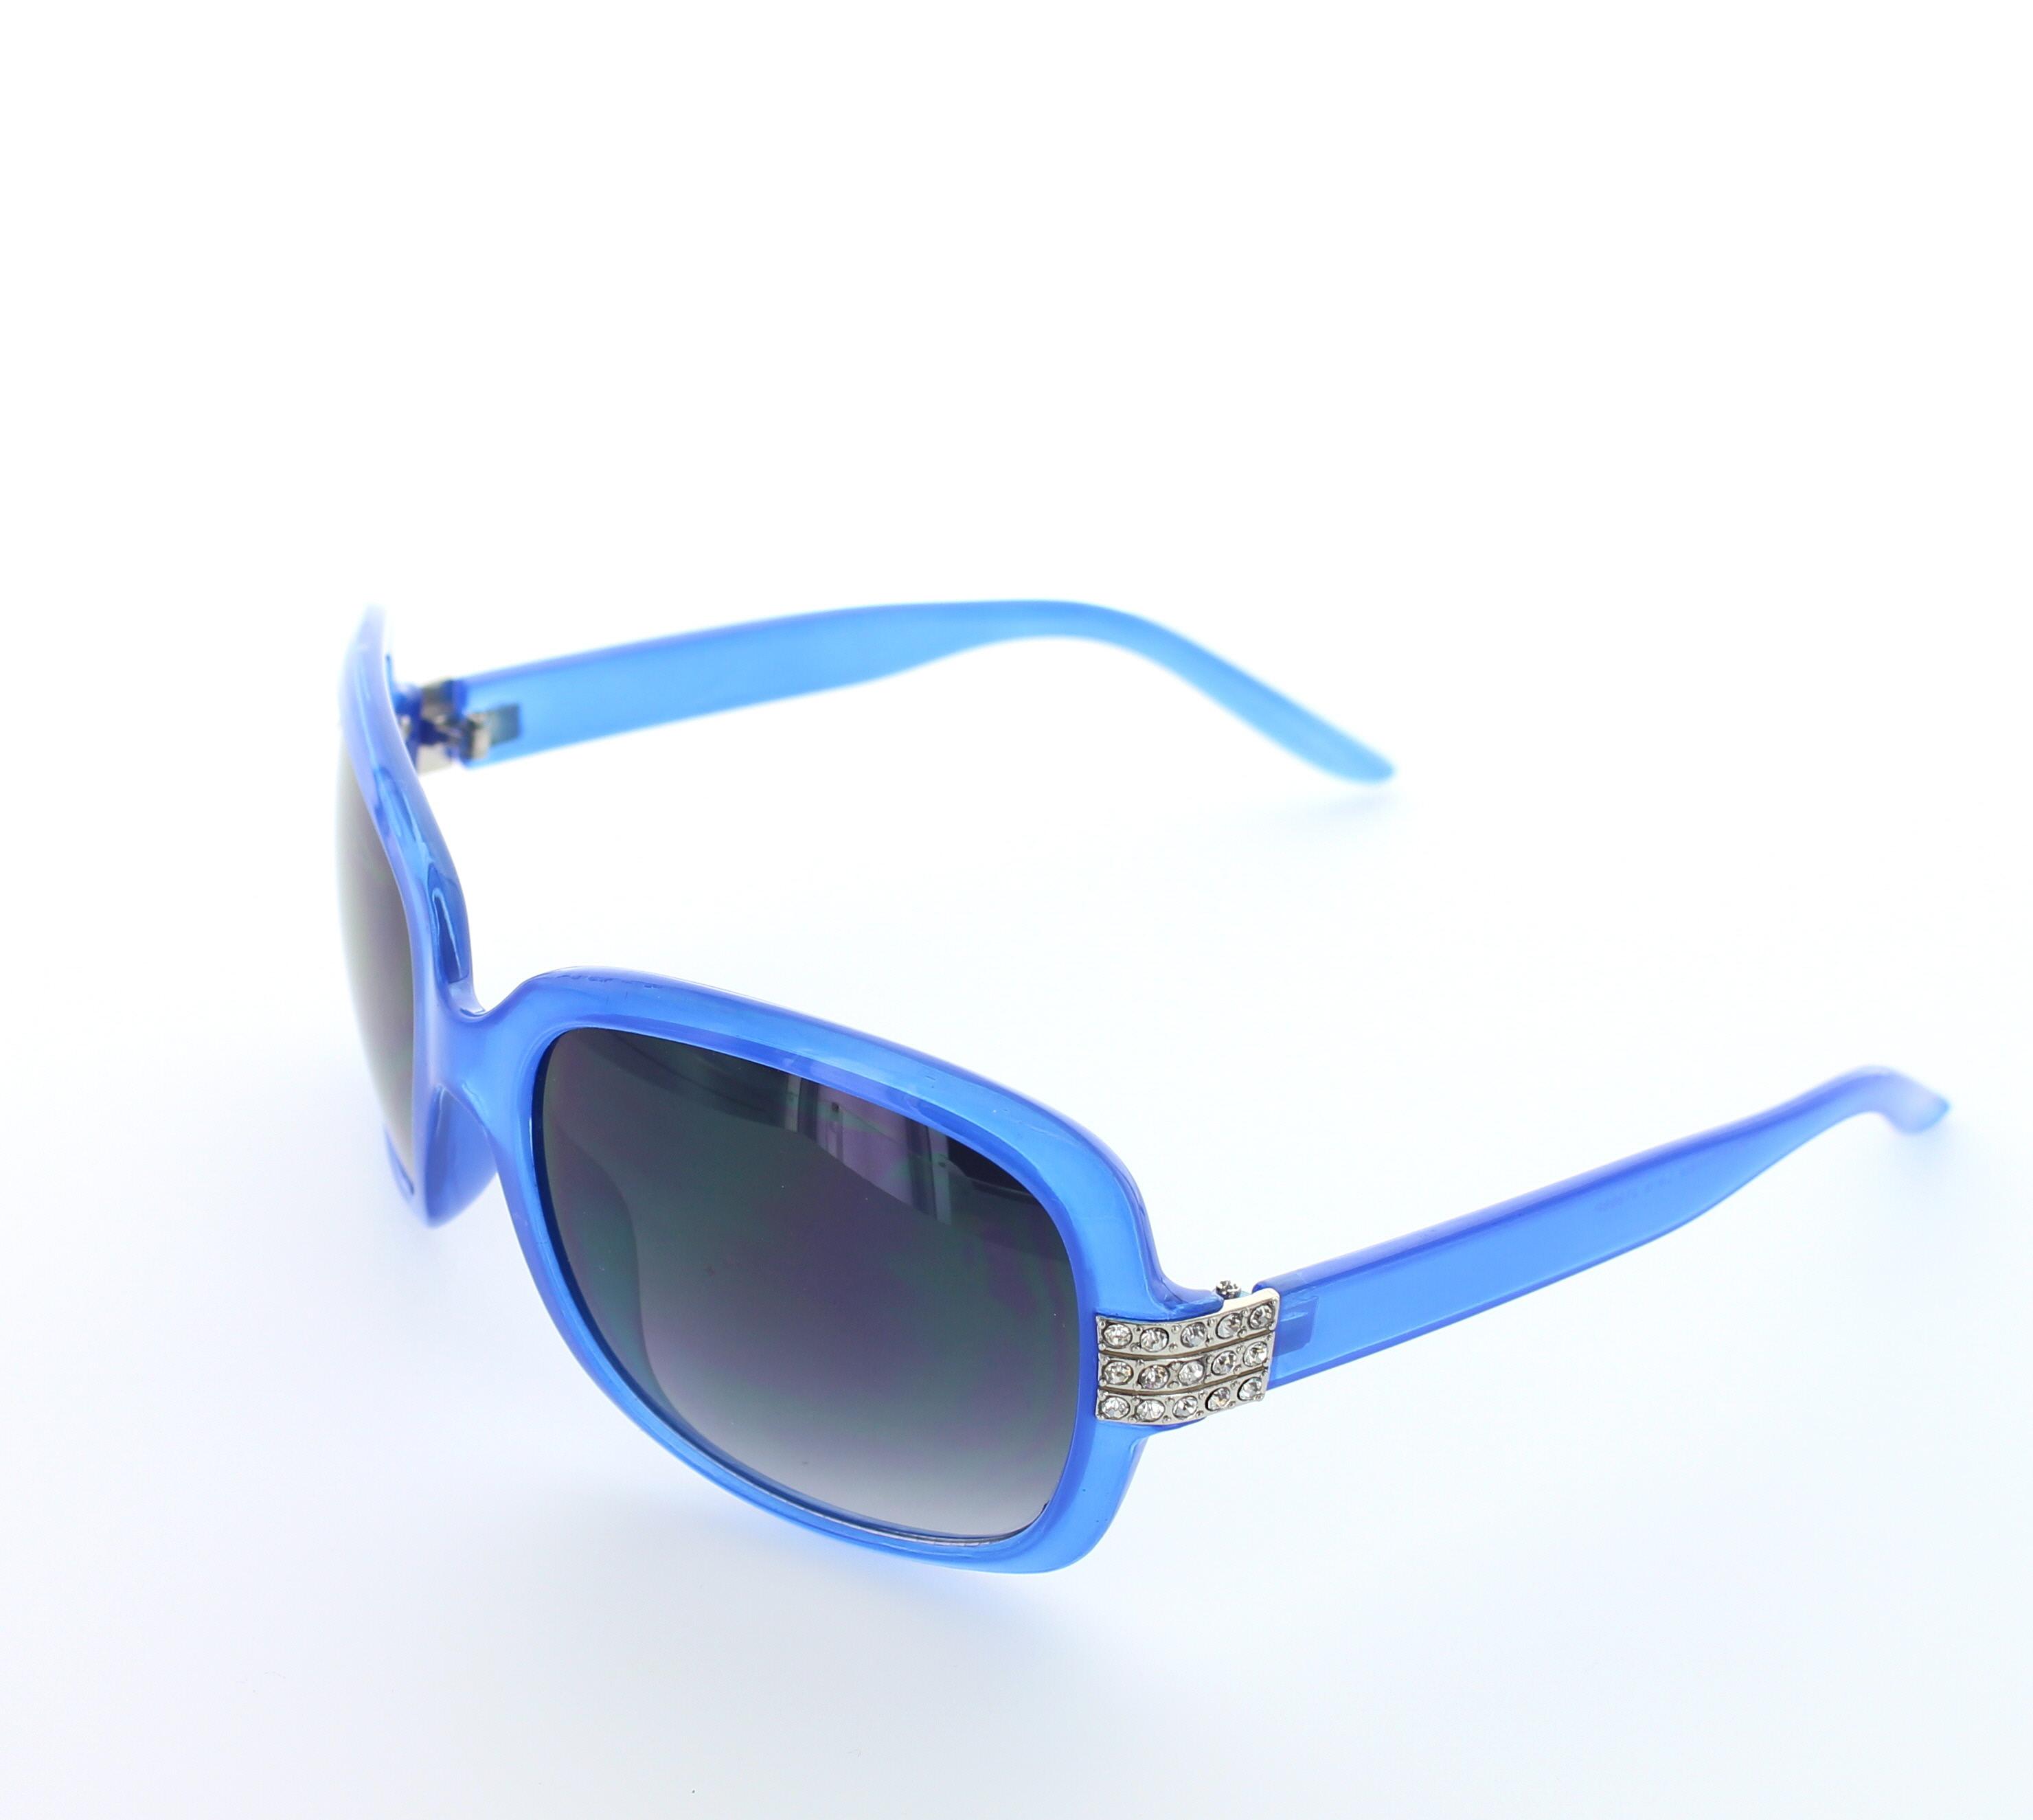 Fashion sunglasses online store 24